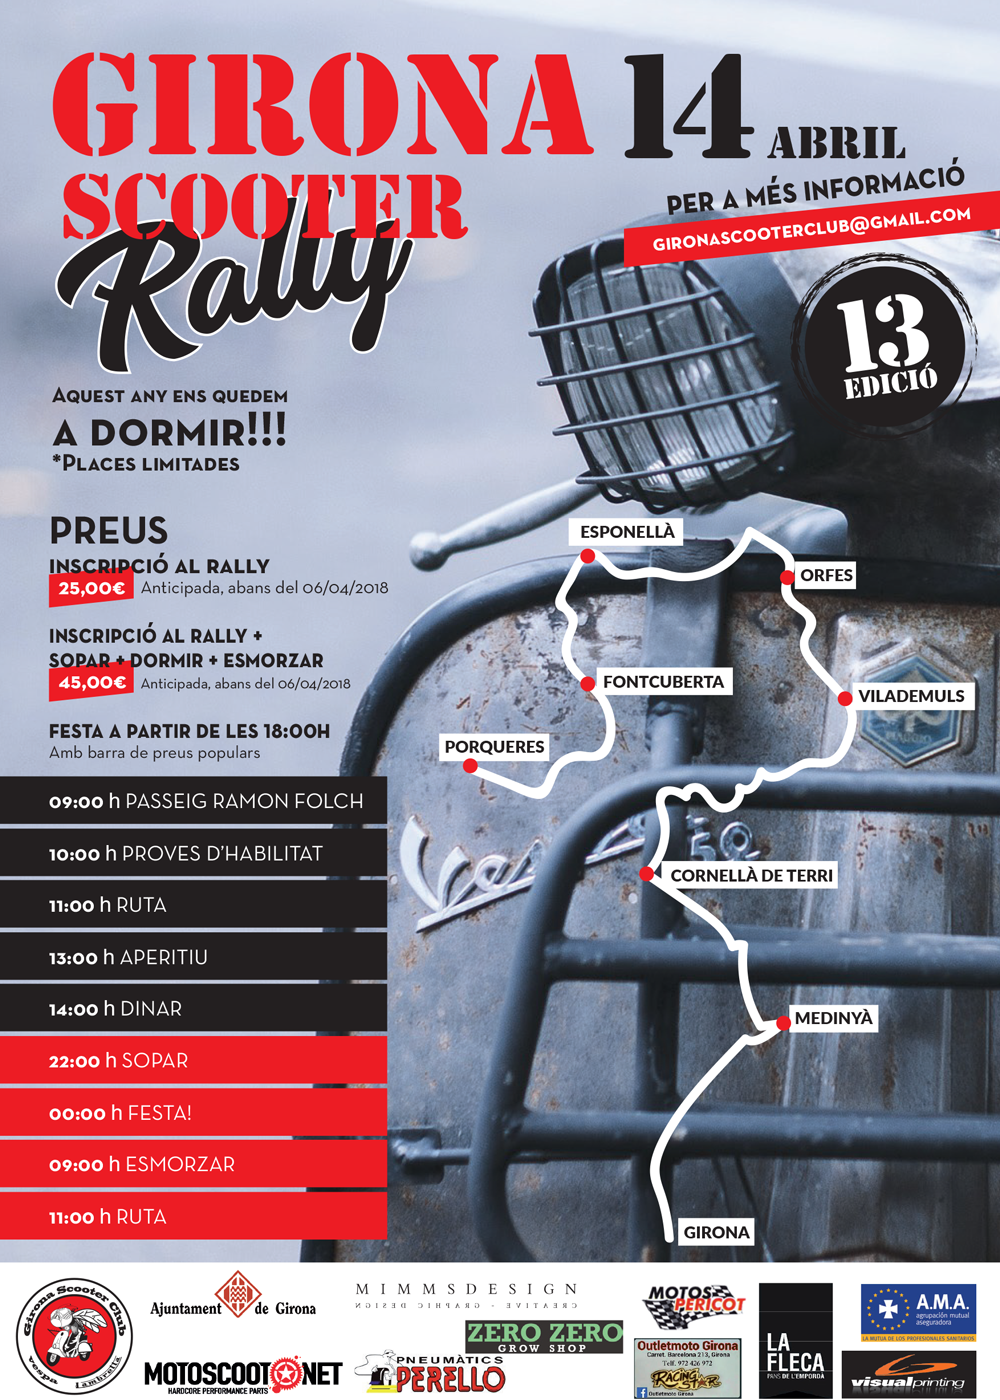 Girona Scooter Rally 2018